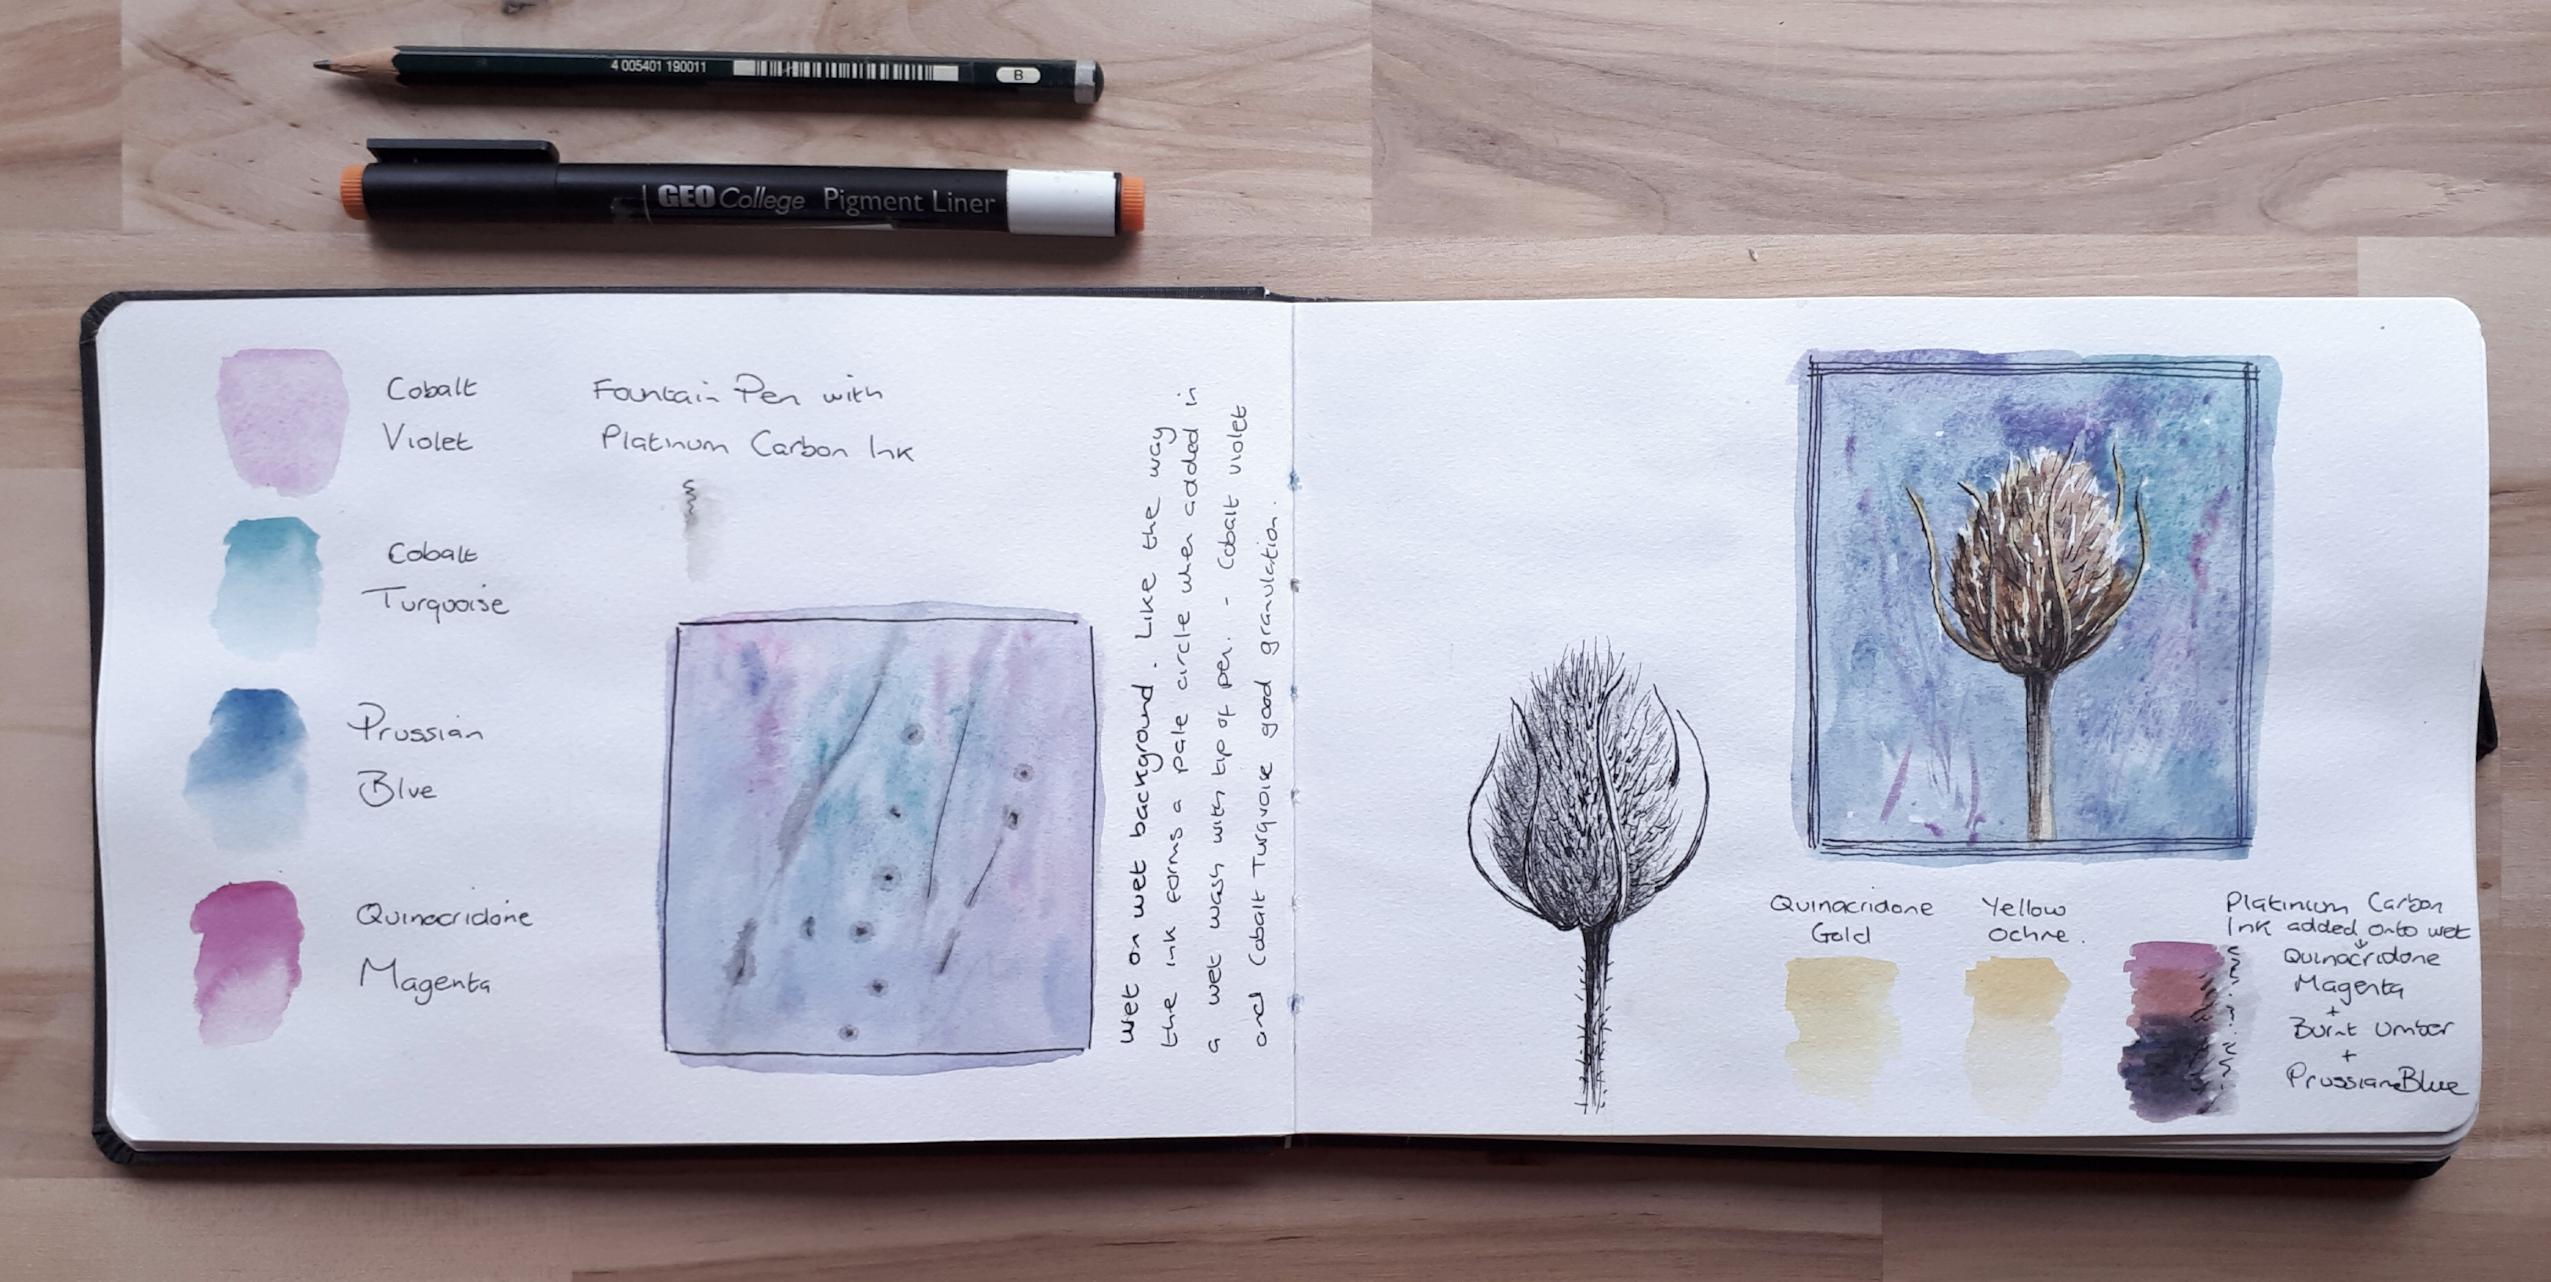 Hahnemuhle Watercolour Book teasel studies